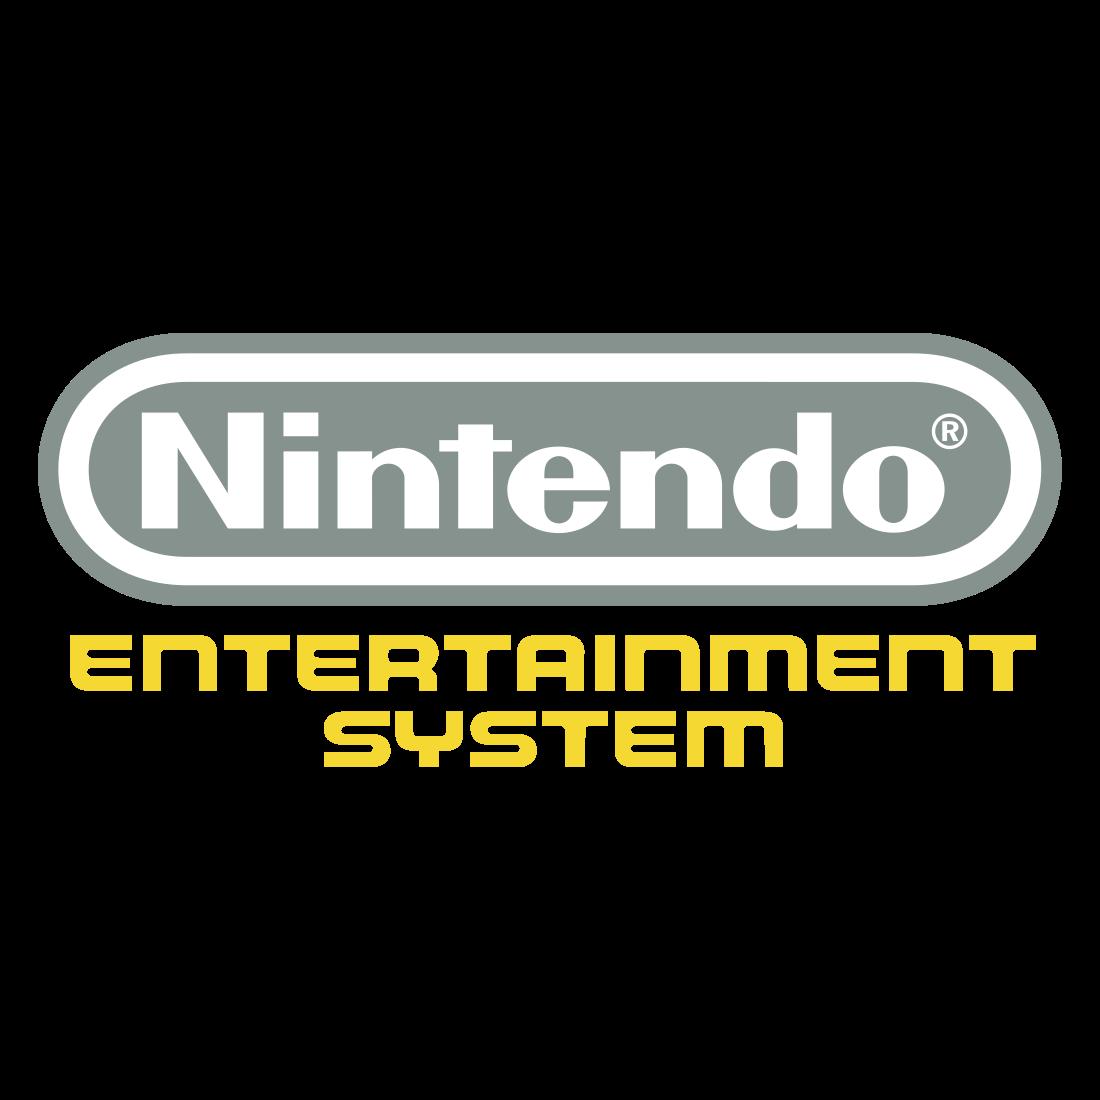 Nintendo Entertainment System (NES) logo